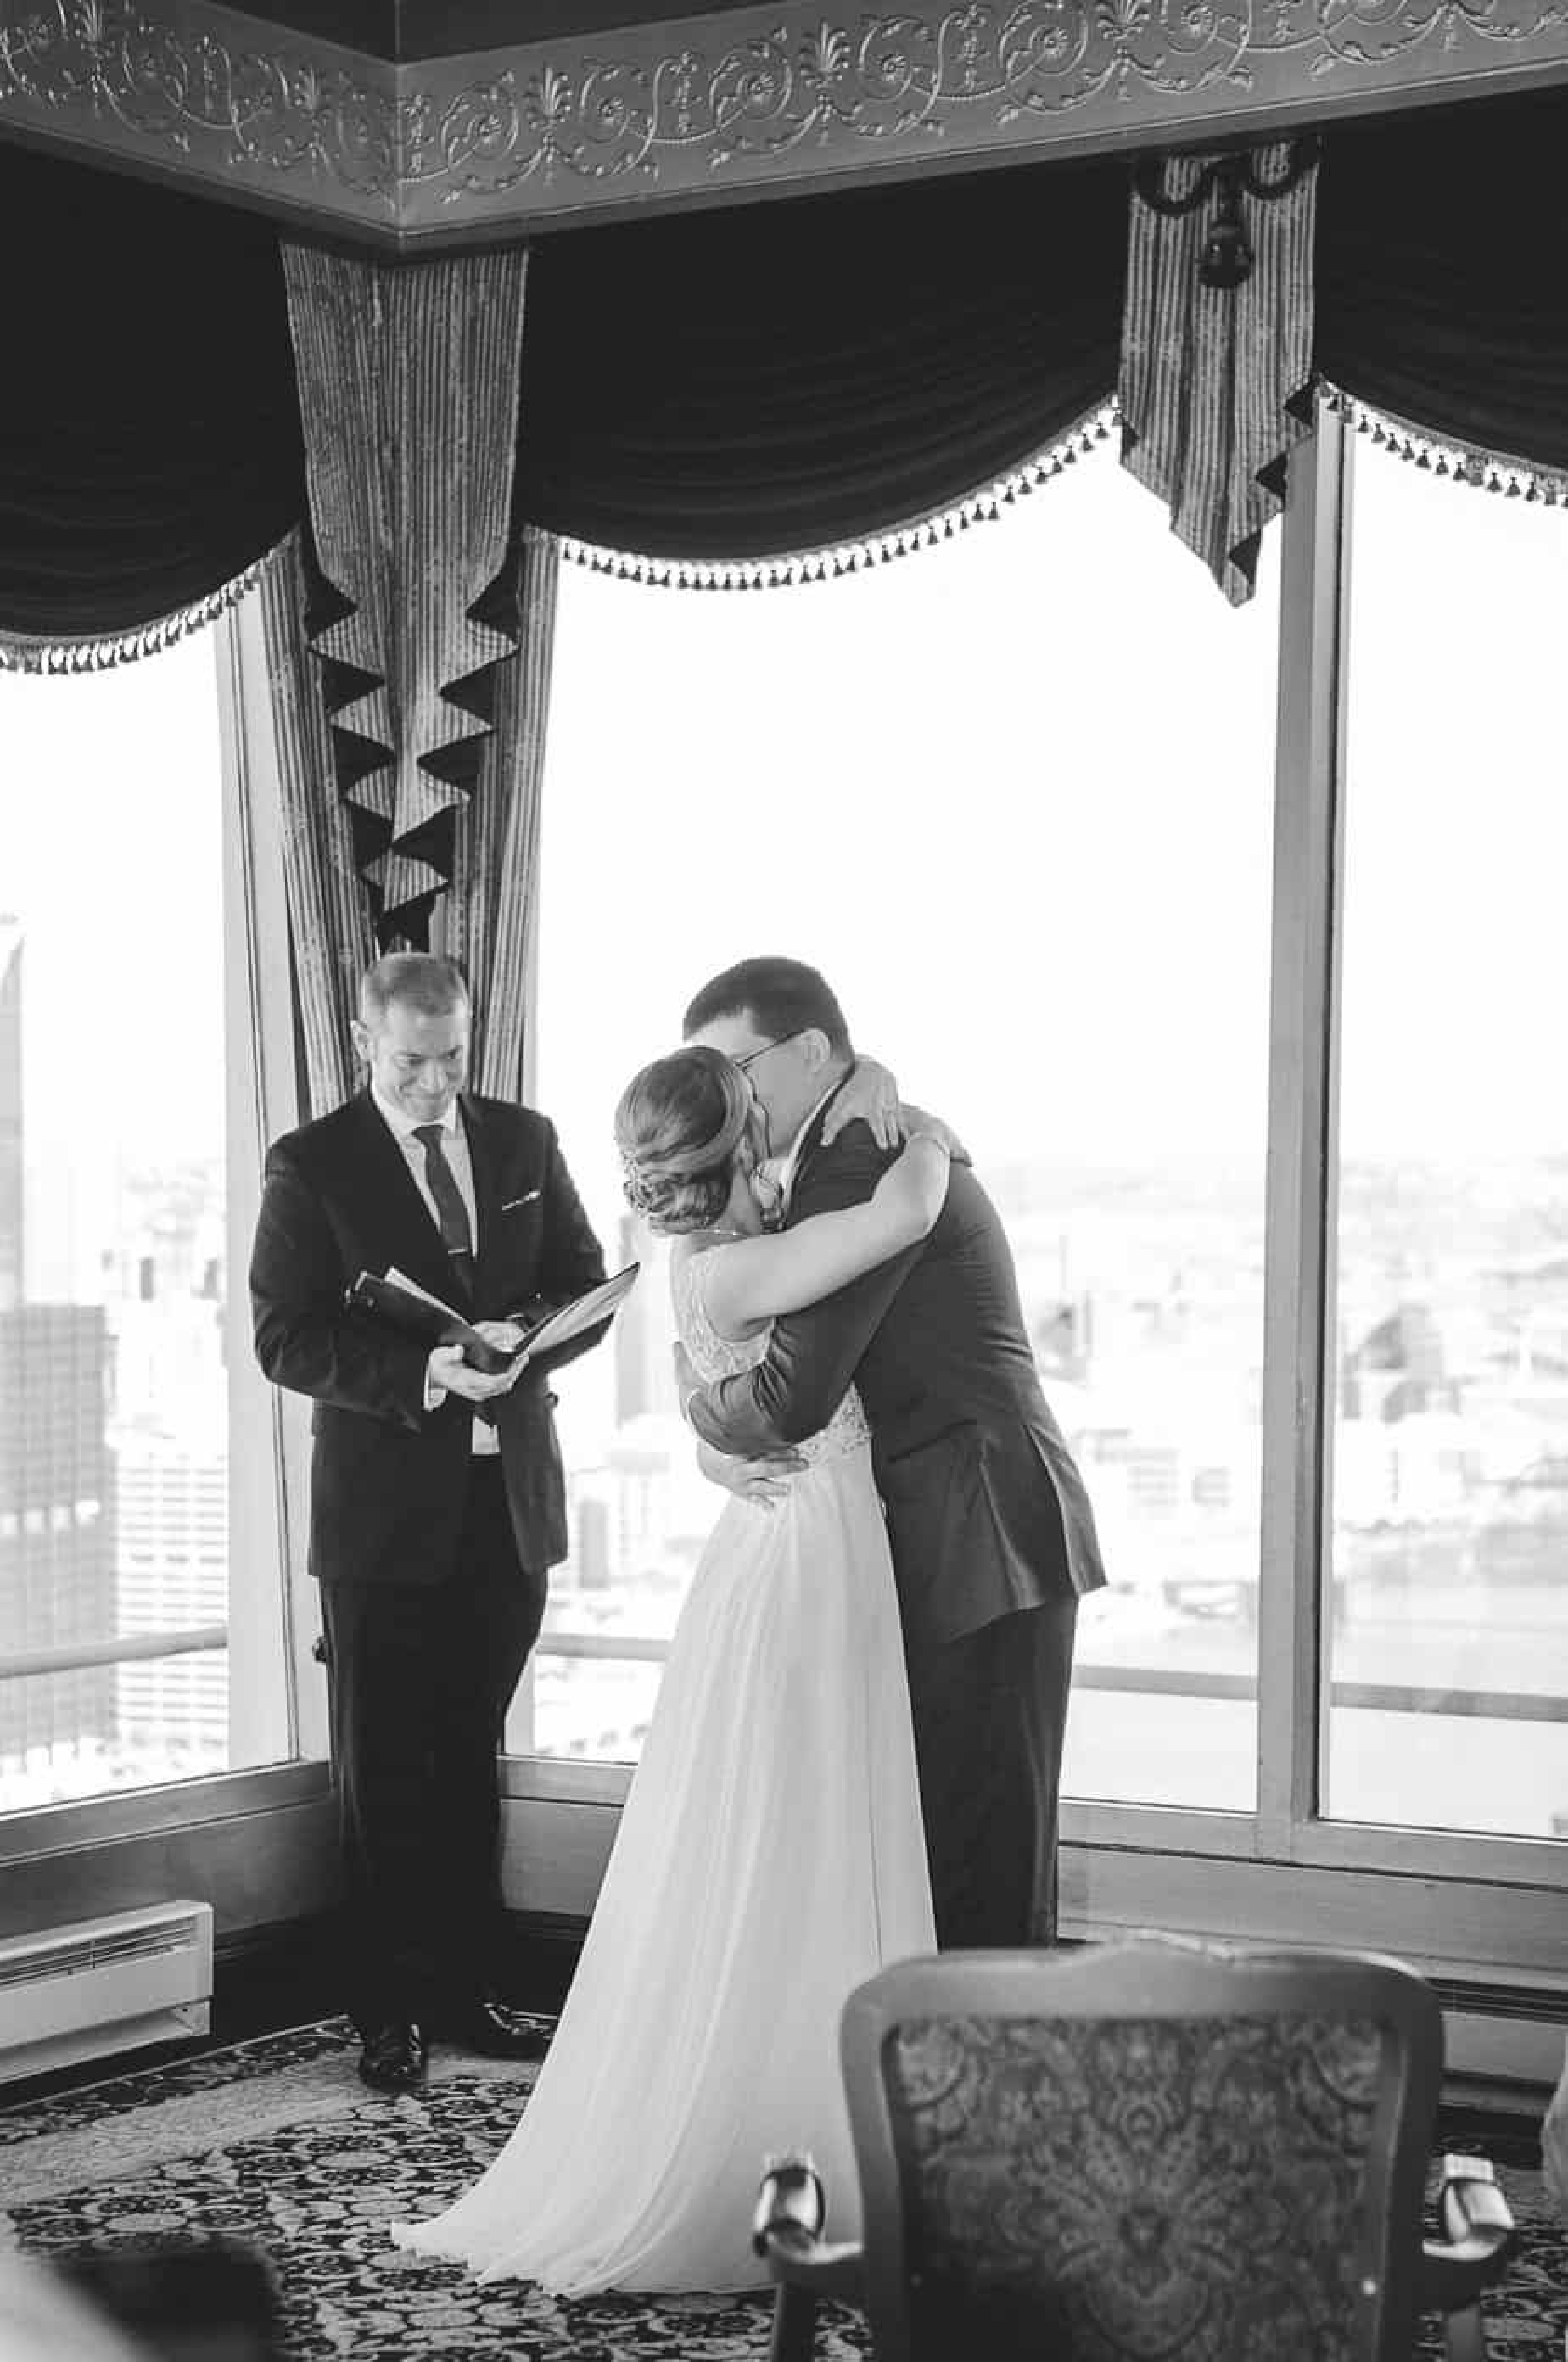 Grifski Wedding Kiss